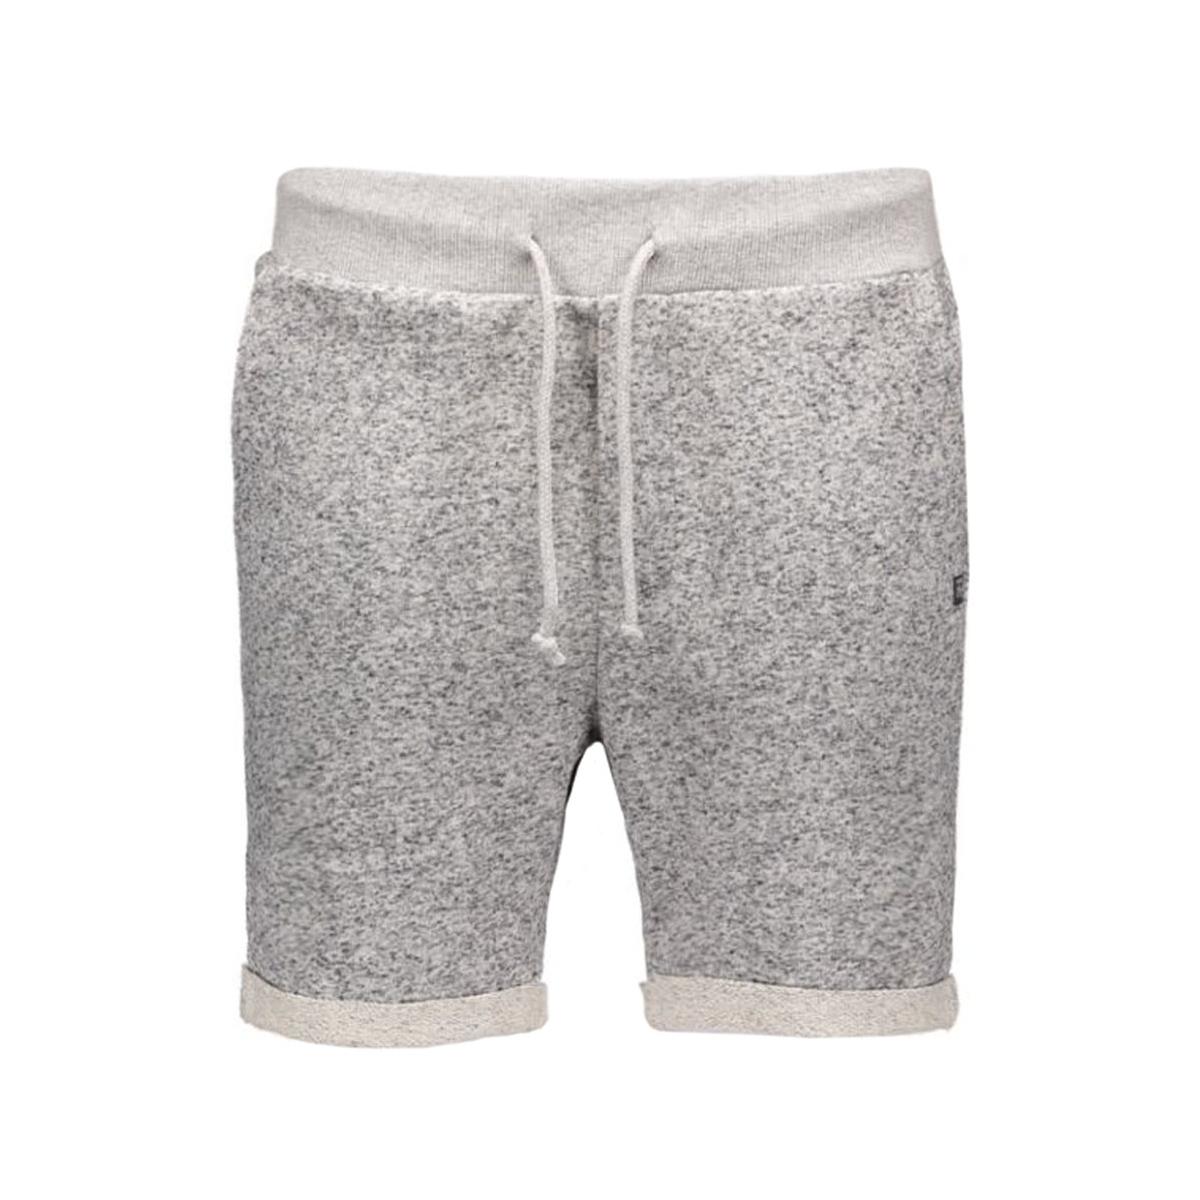 jjorboost sweat shorts 12104874 jack & jones korte broek grey melange